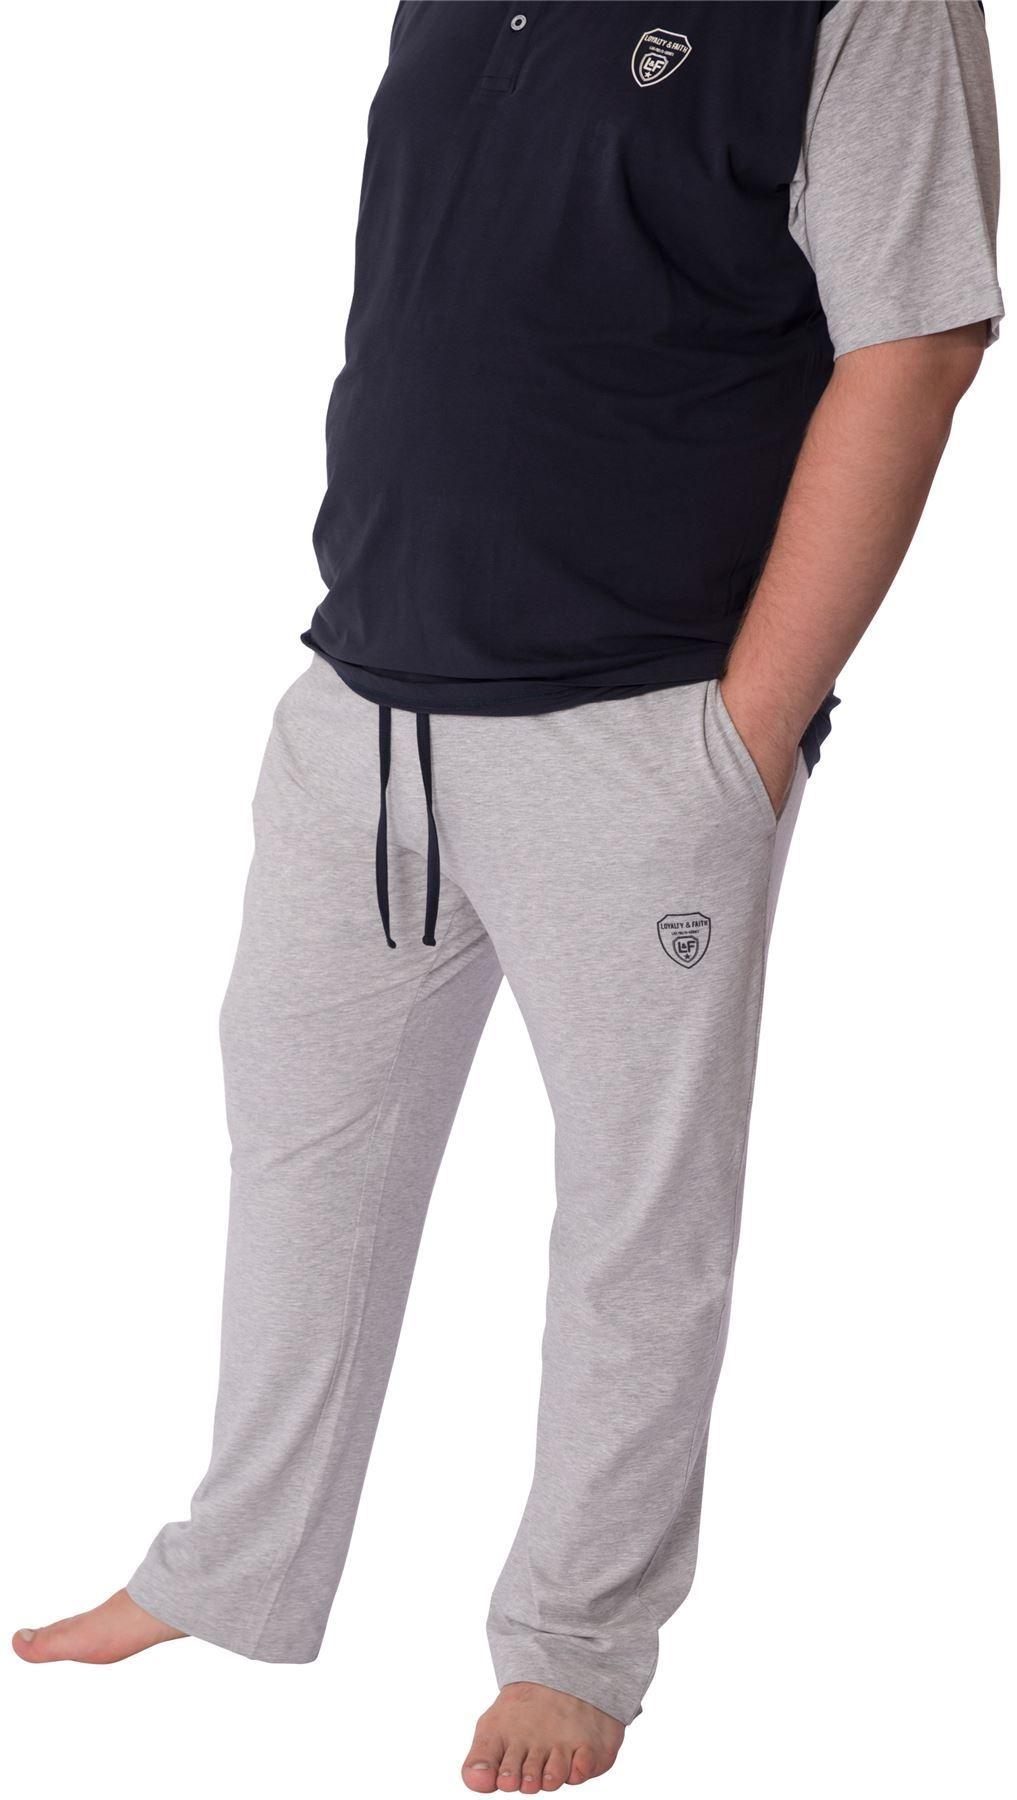 Loyalty-amp-foi-GRAND-HOMMES-pyjama-pantalon-manche-courte-haut-grande-taille